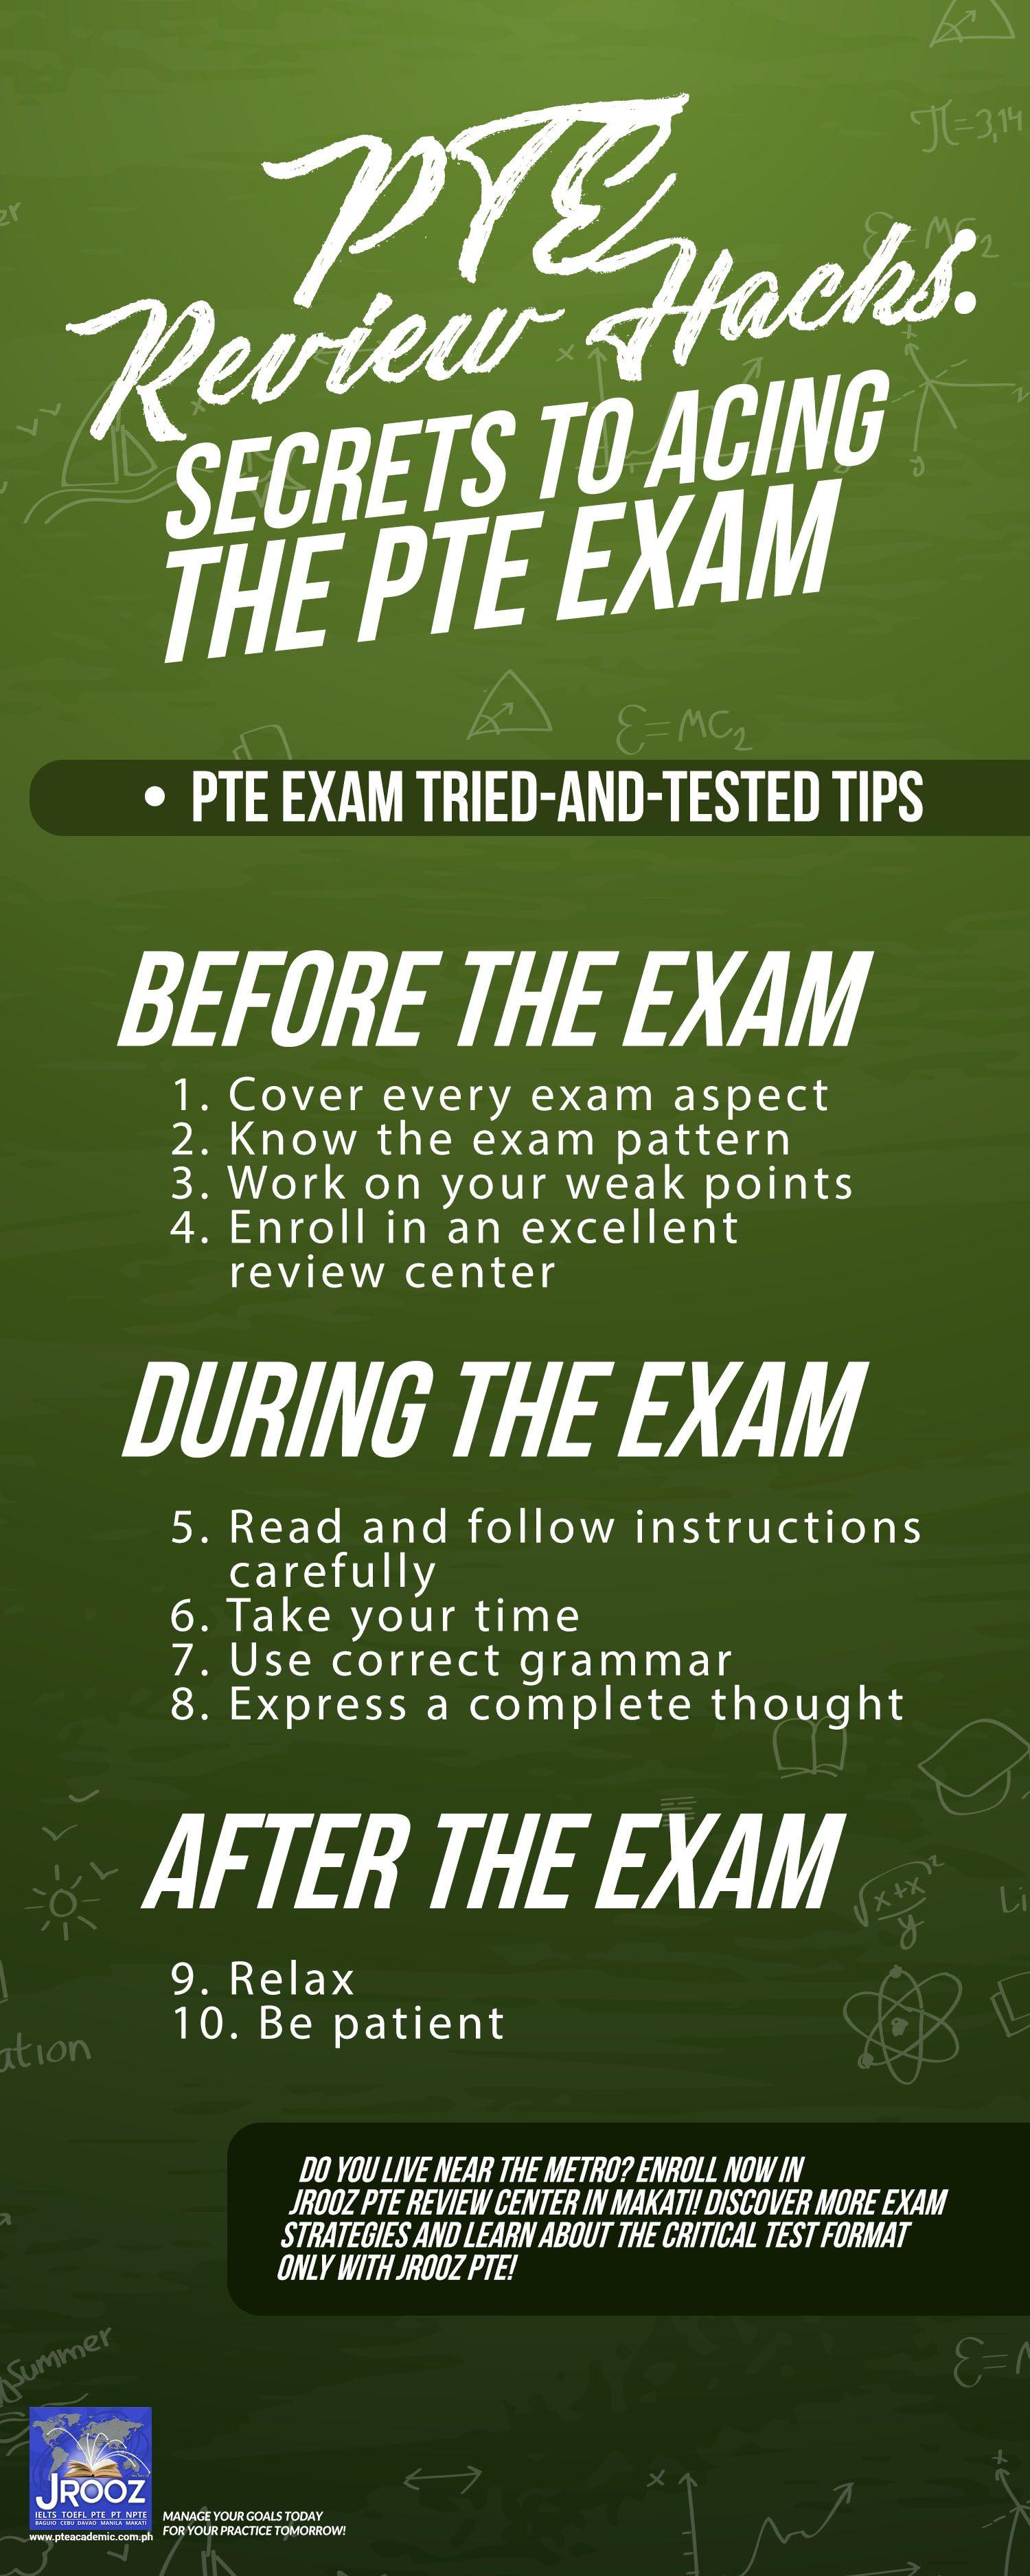 PTE Review Hacks: Secrets to Acing the PTE Exam | Jrooz PTE Academic